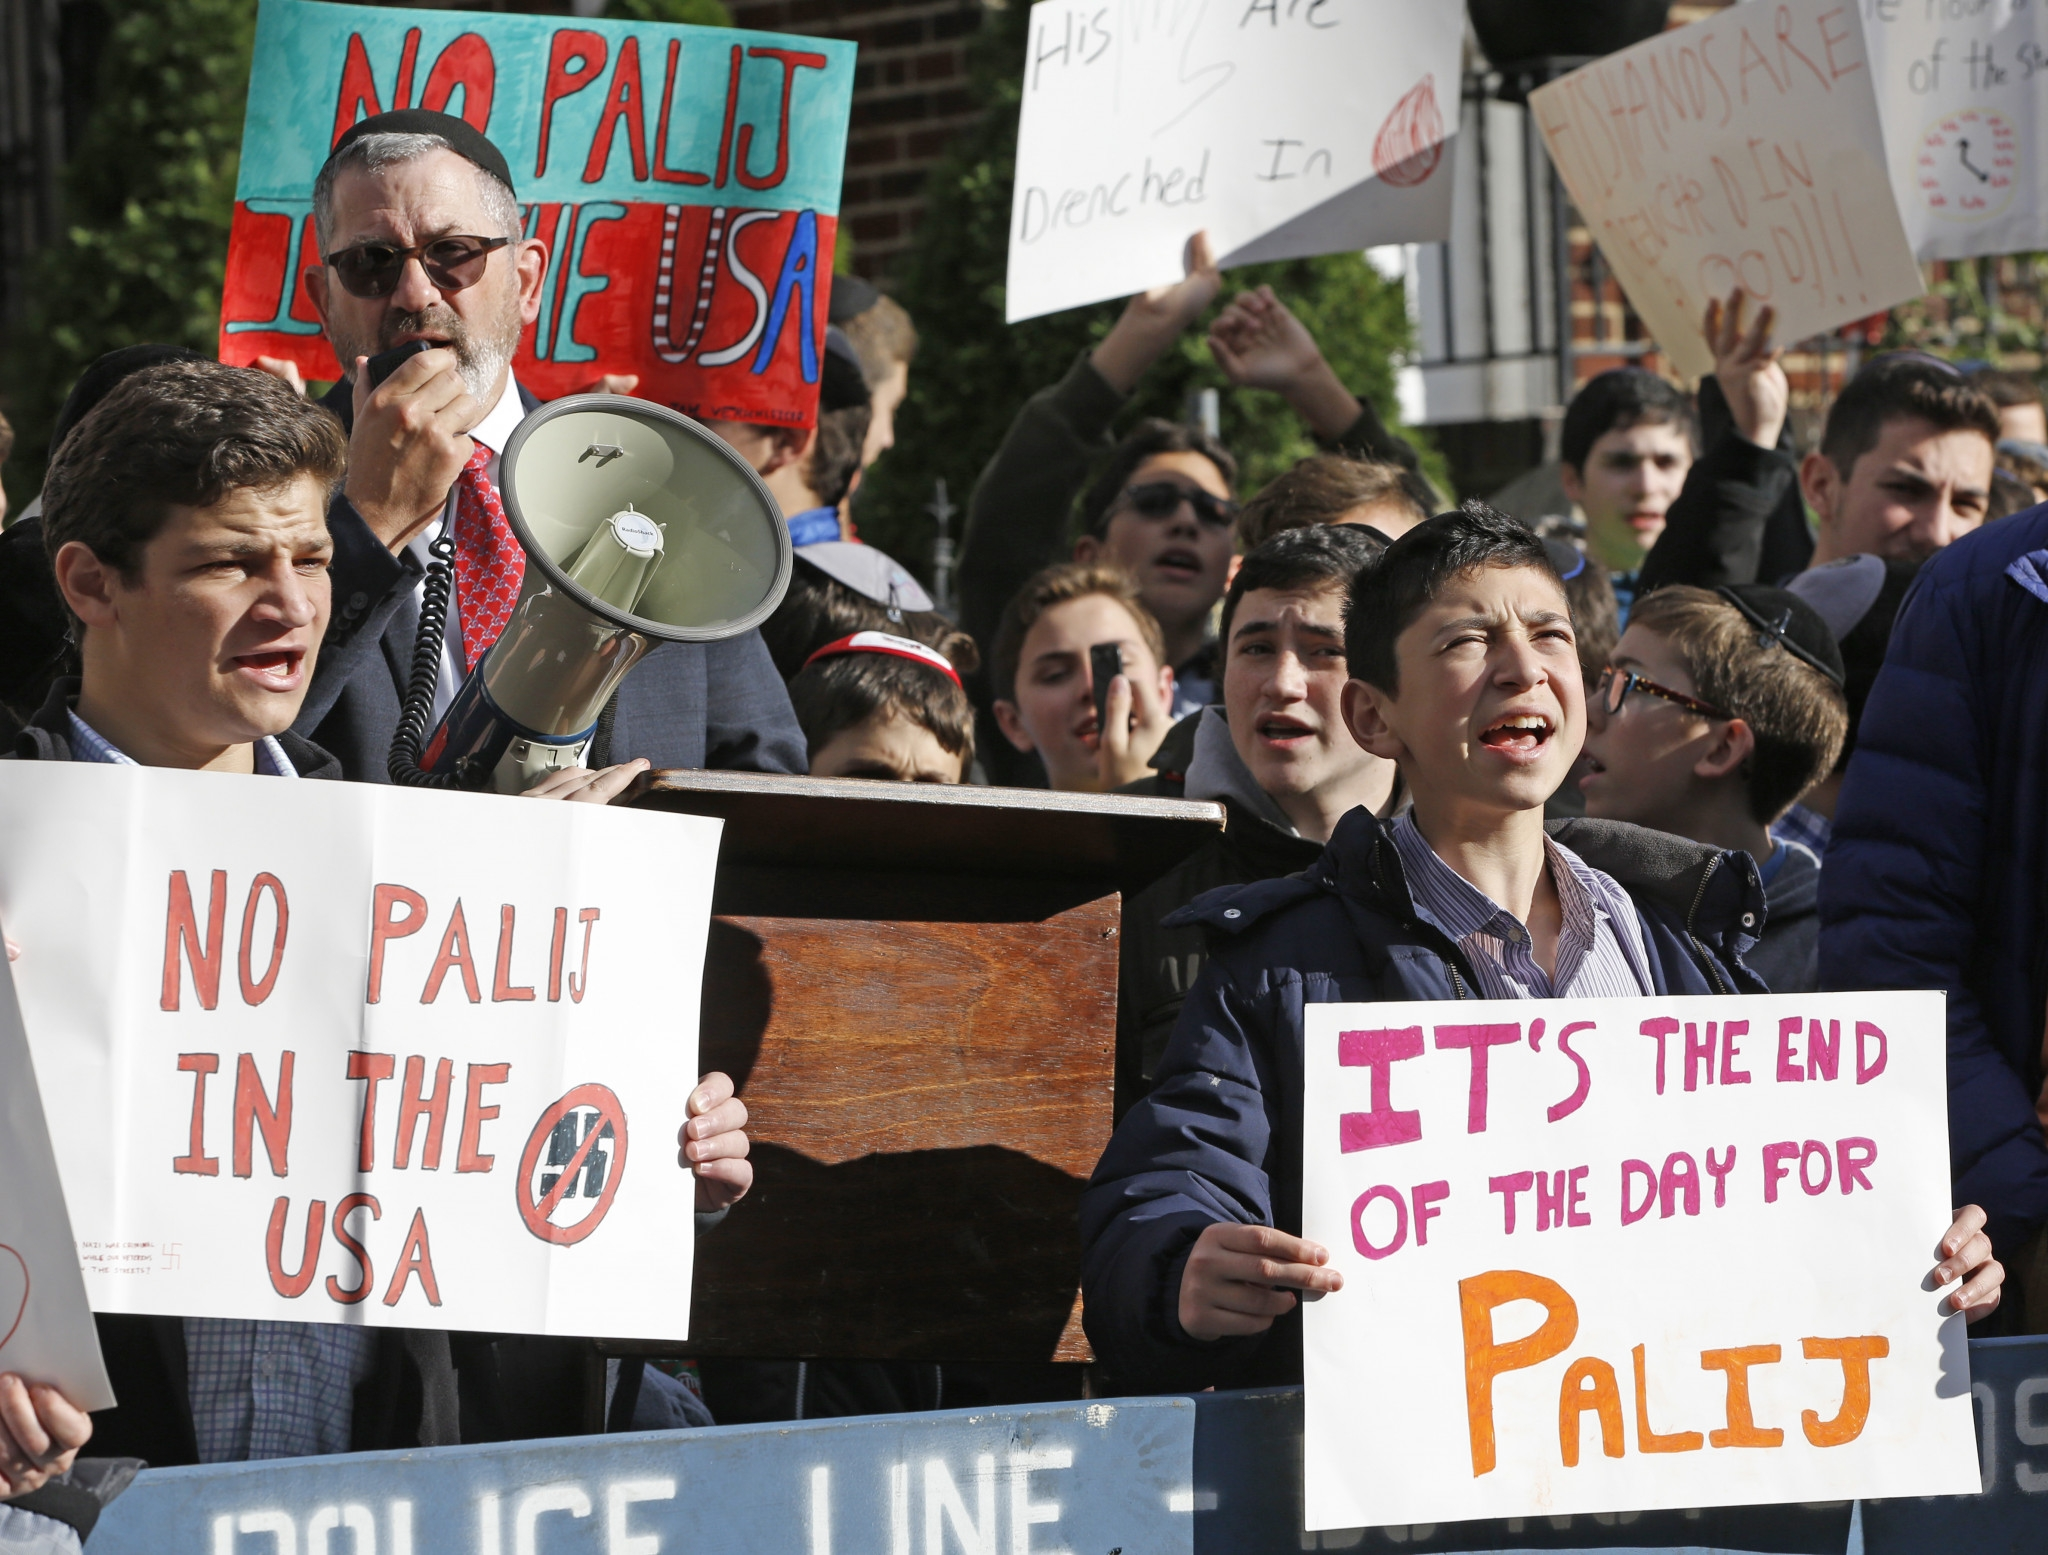 Demonštranti pred domom bývalého nacistického dozorcu Jakiwa Palija